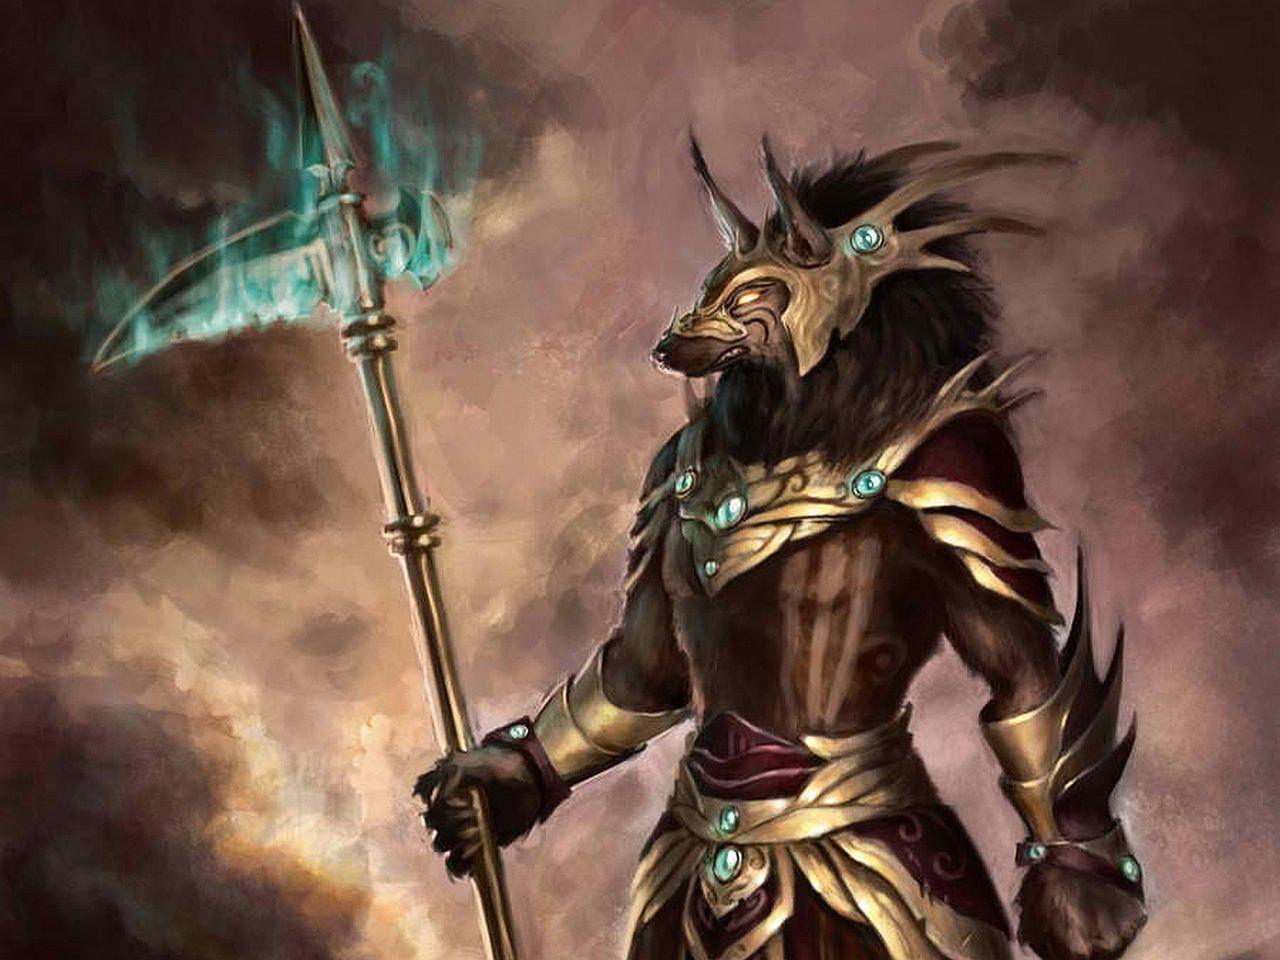 Egypt Warrior Illustration Anubis Pyramid Fantasy Art: Exalted 3e Edition